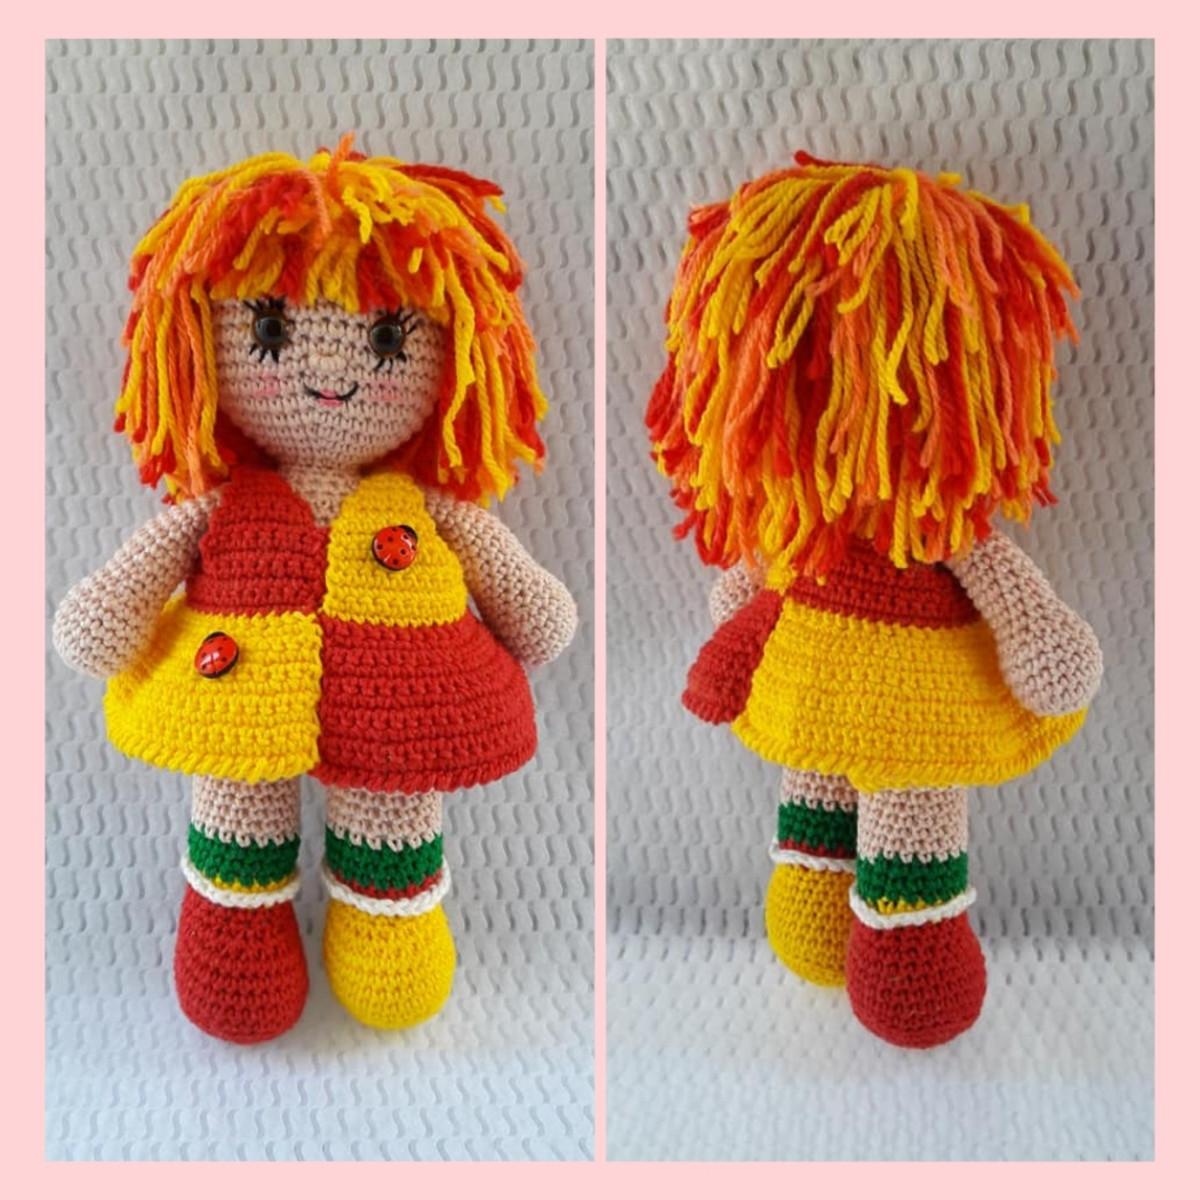 Boneca emilia em amigurumi | Boneca emilia, Bonecas de tricô, Bonecas | 1200x1200